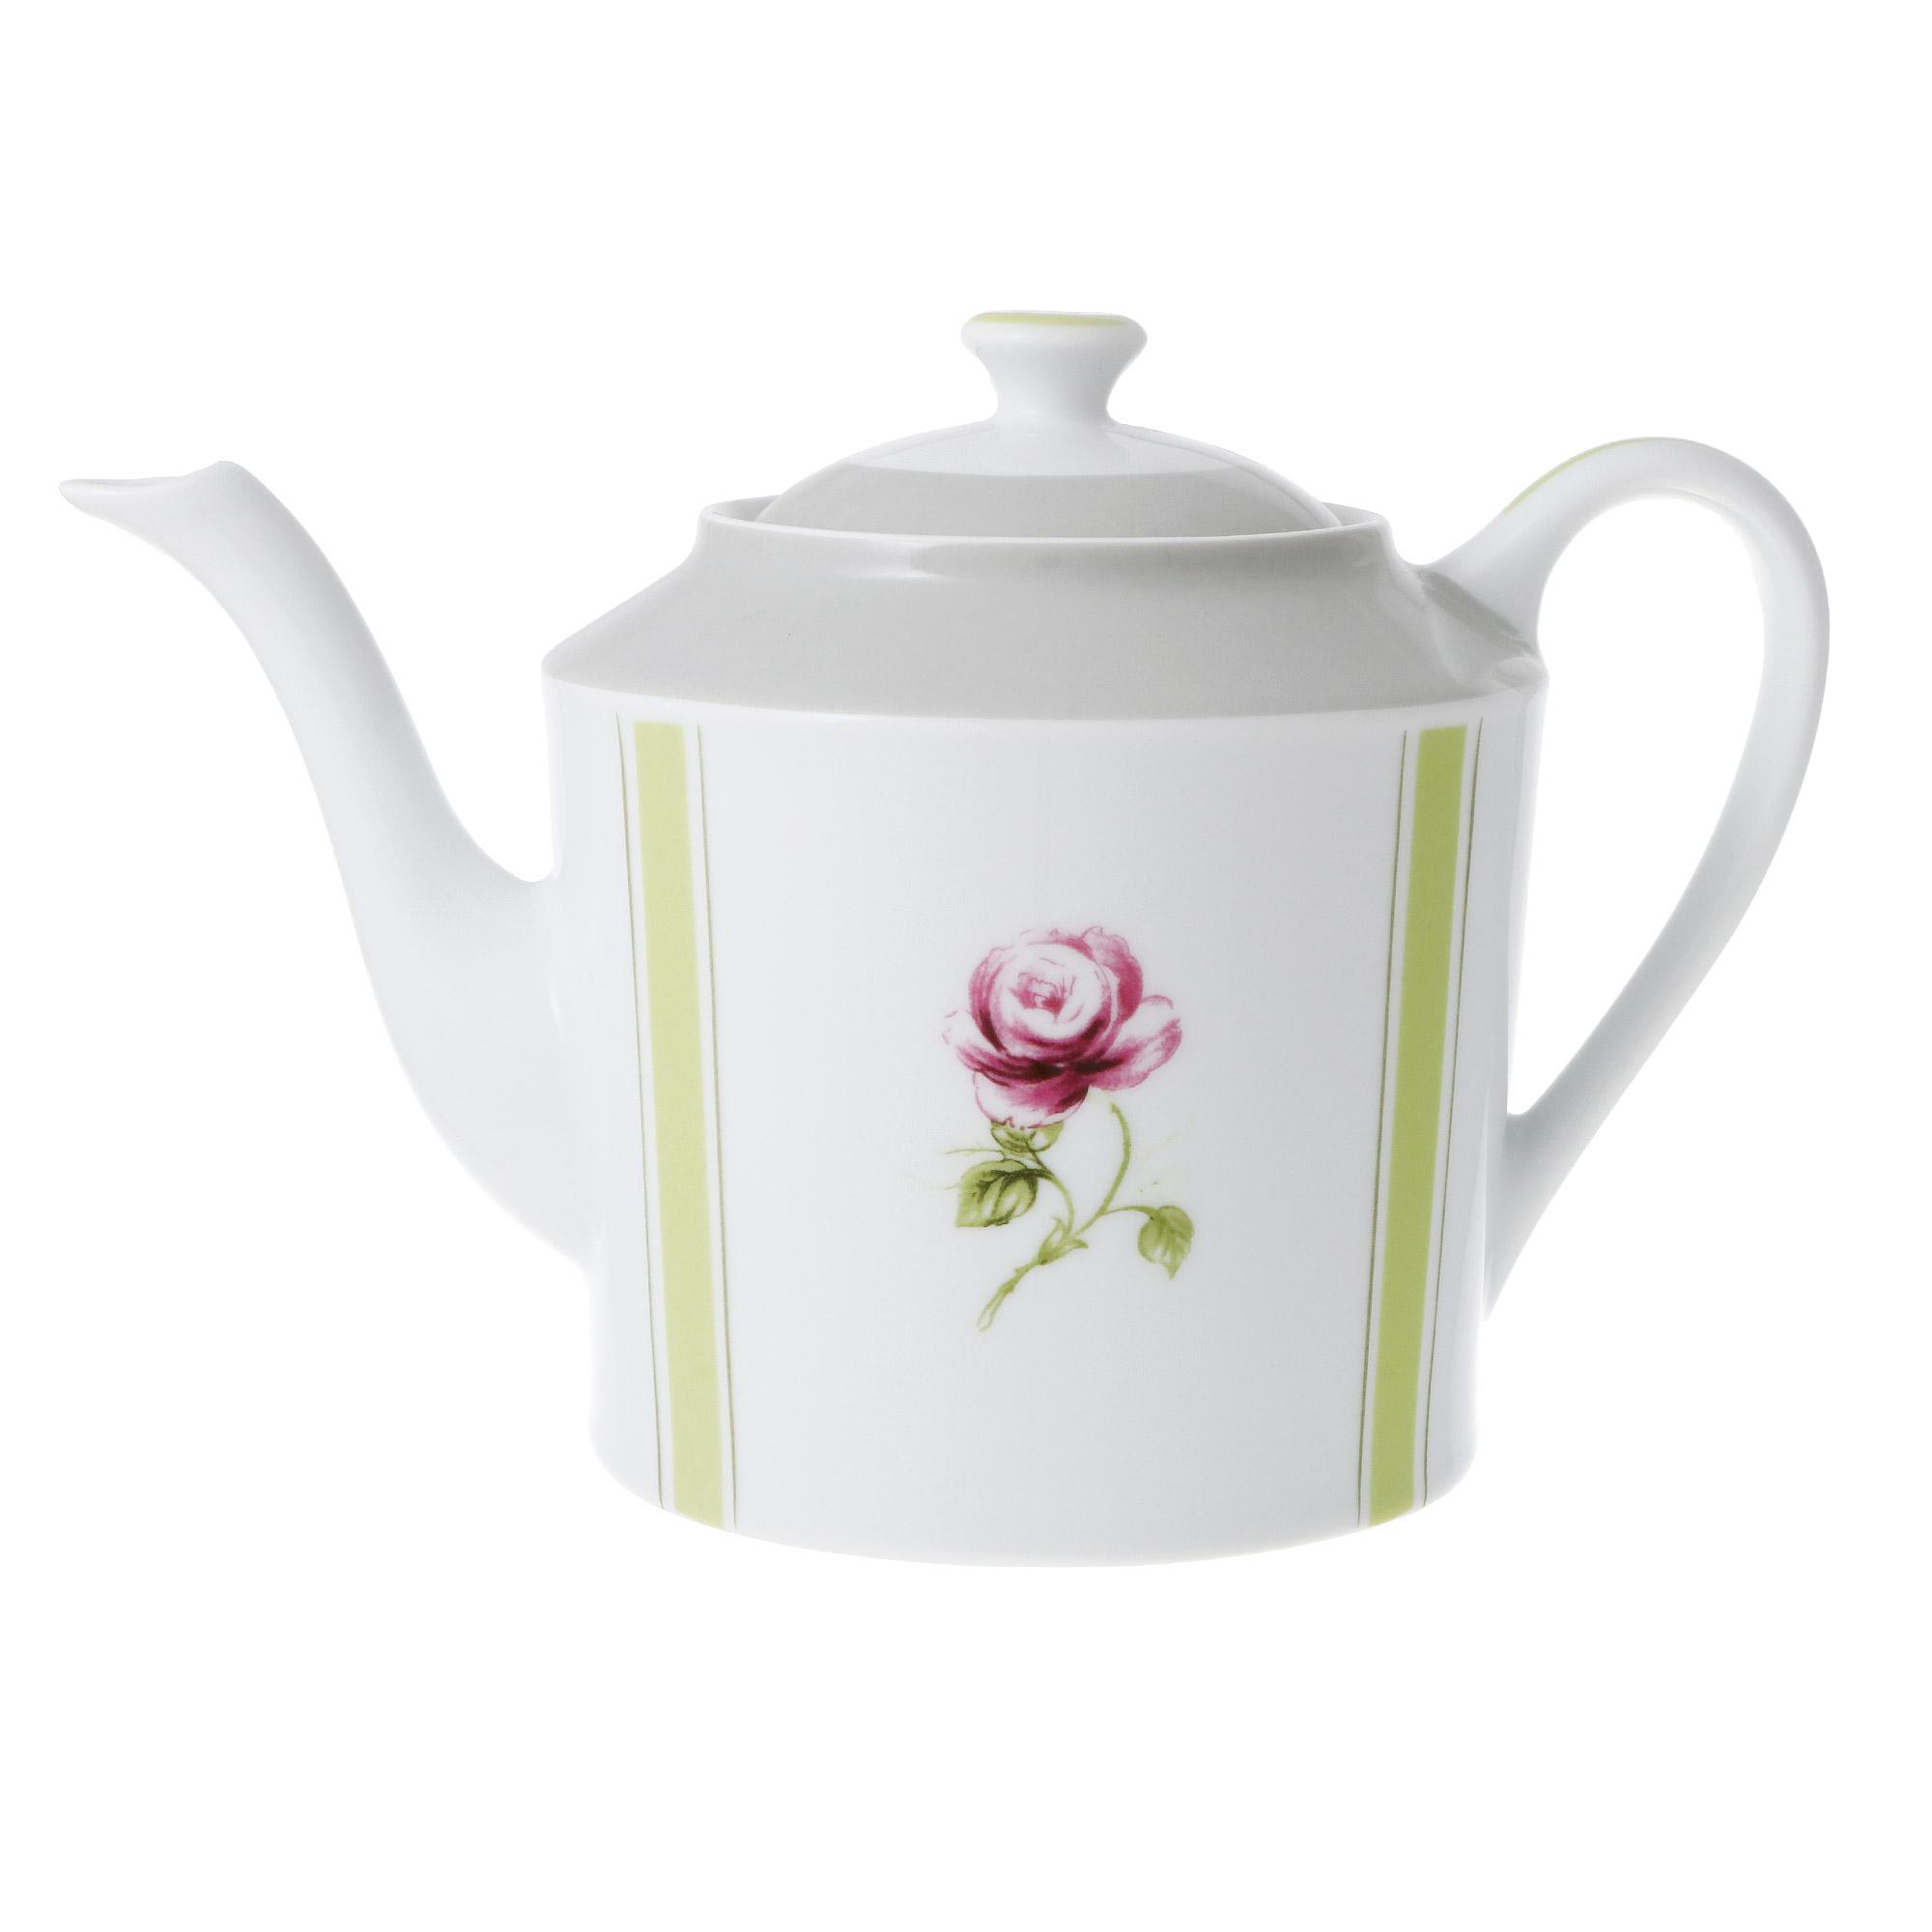 Чайник Yves de la Rosiere Cocooning 1,2 л тарелка плоская yves de la rosiere cocooning 27 см